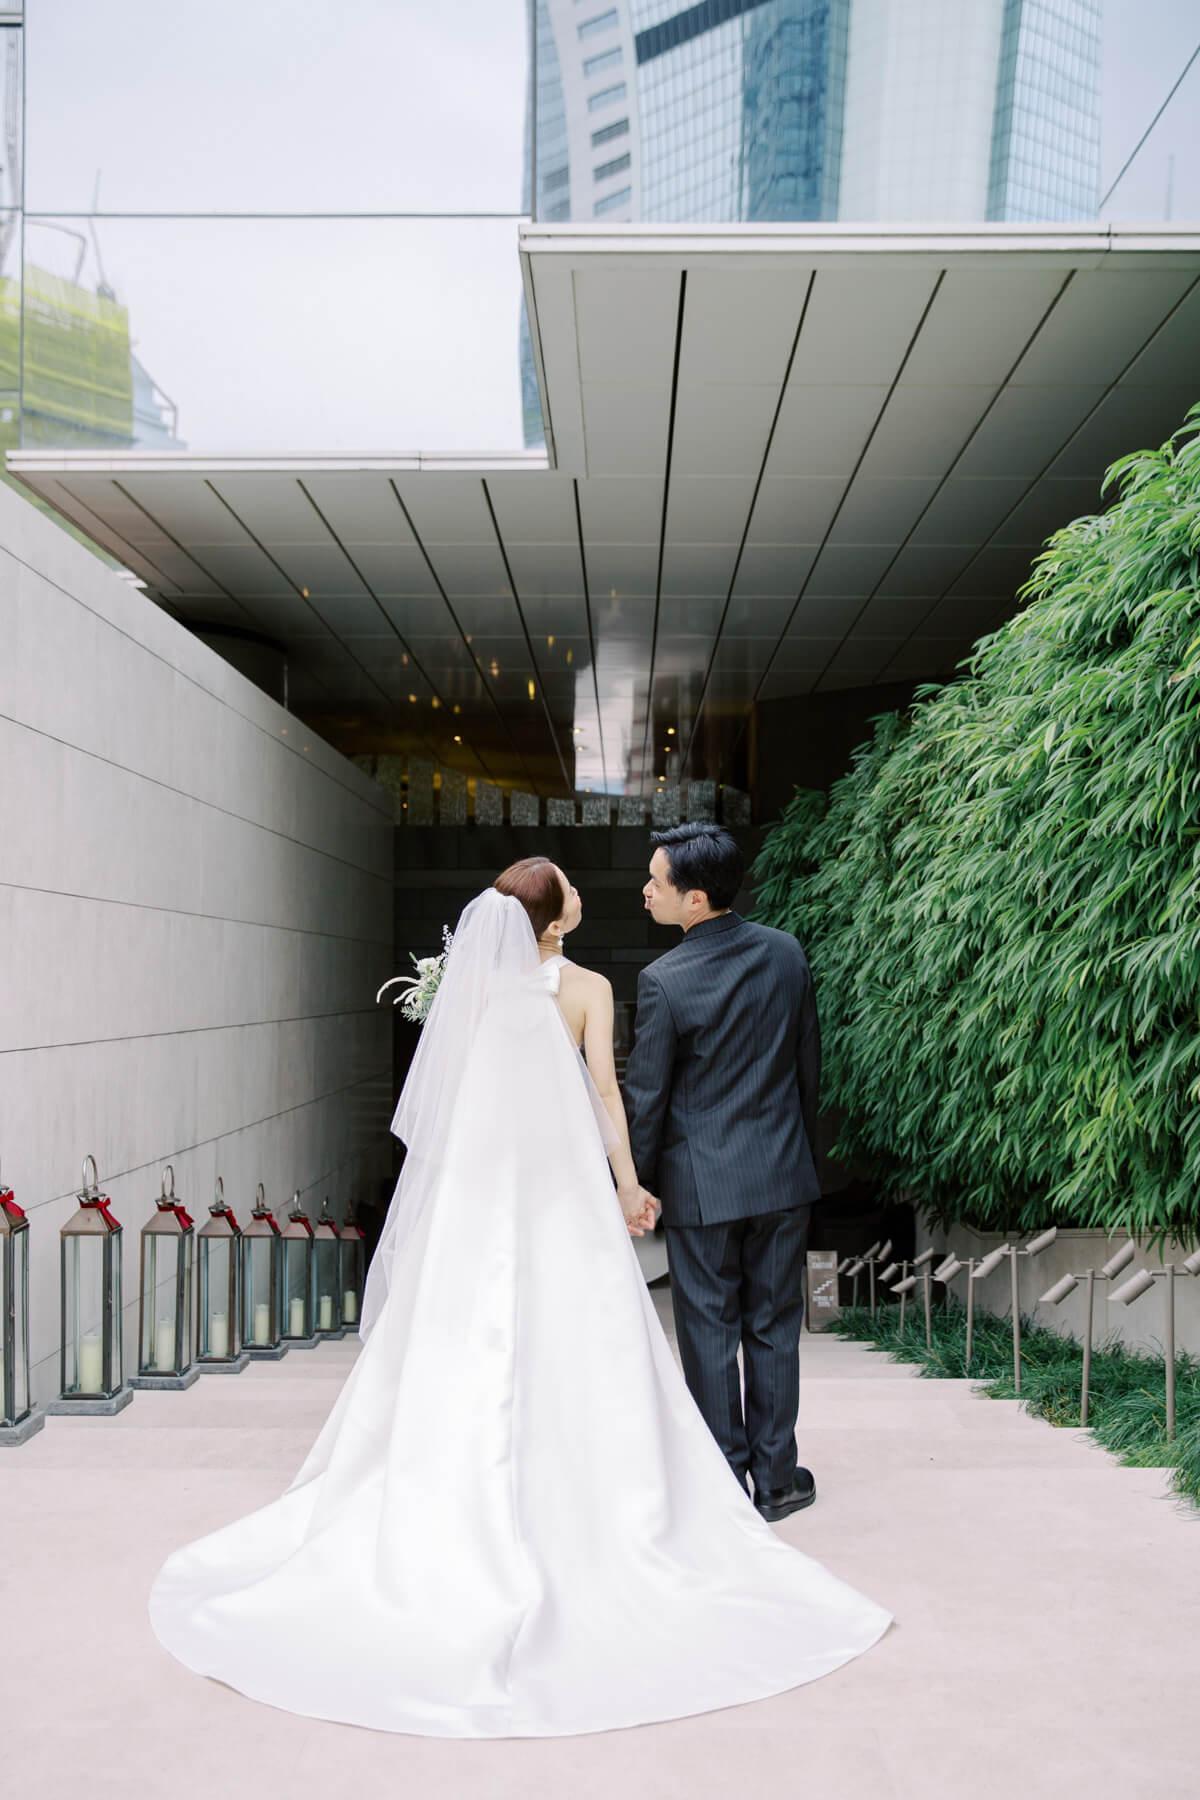 nikkiloveu-hongkong-weddingday-theupperhouse-as-025.jpg